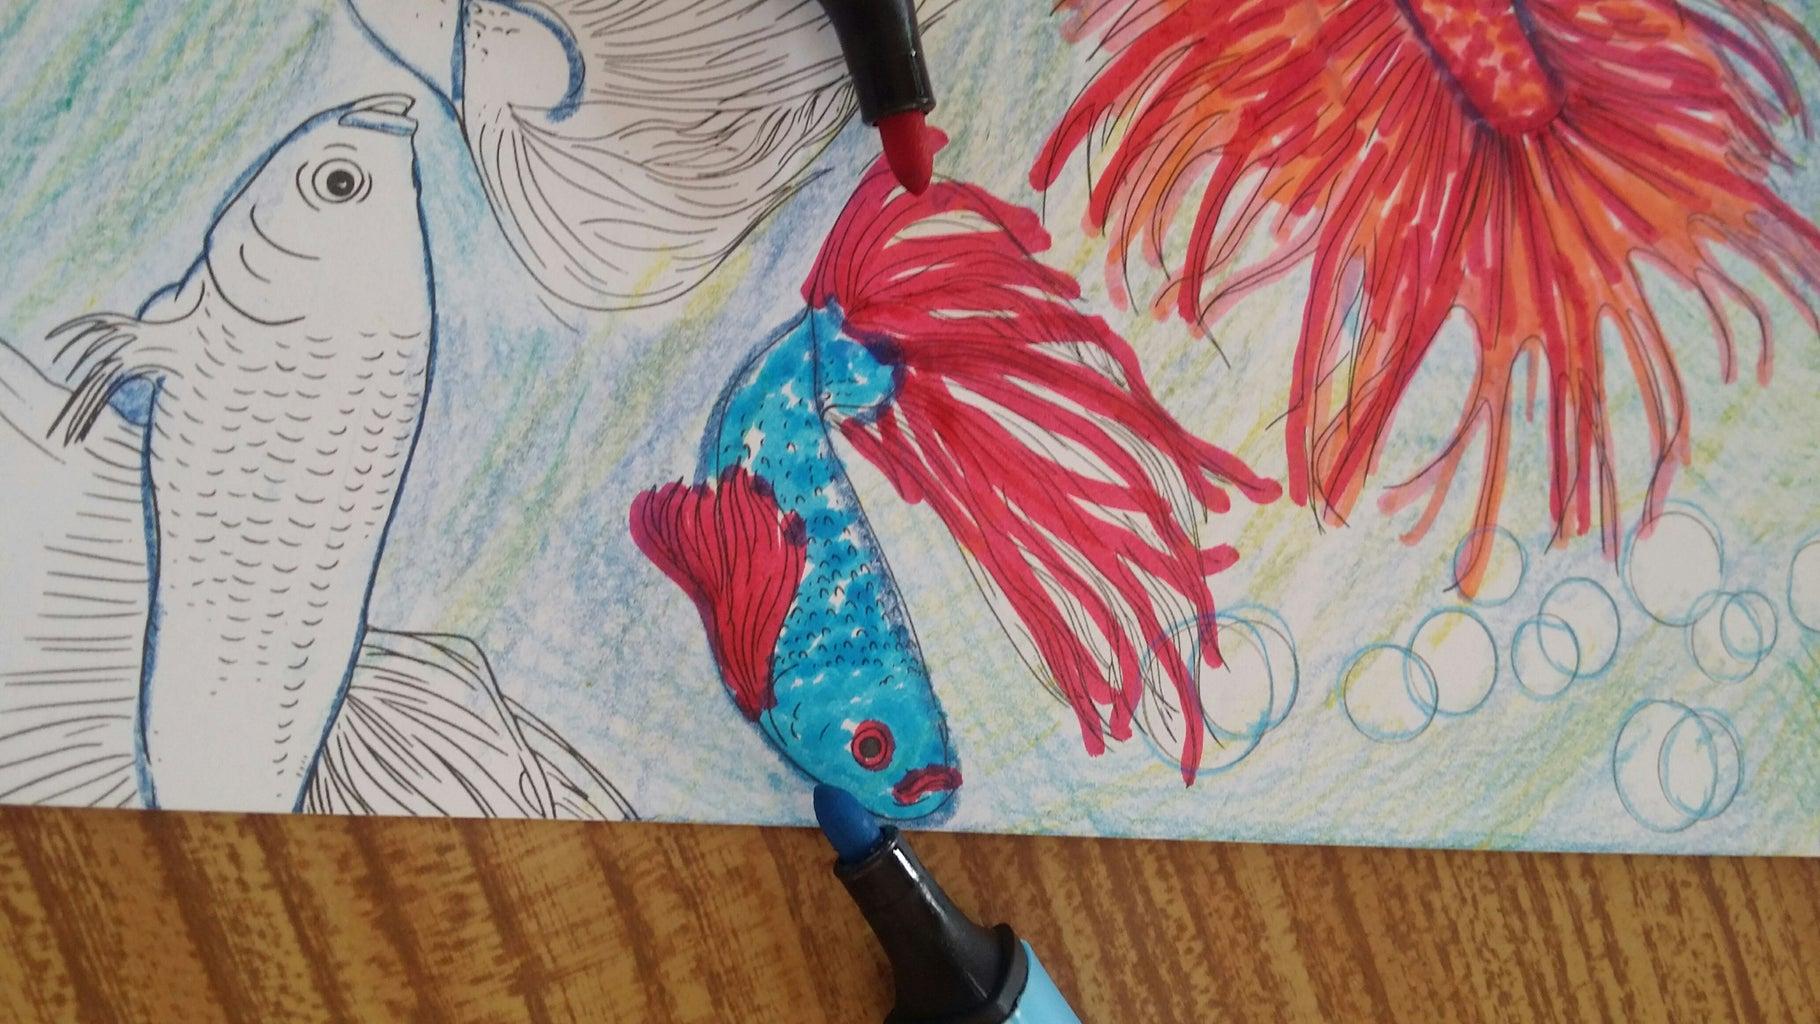 4th Fish